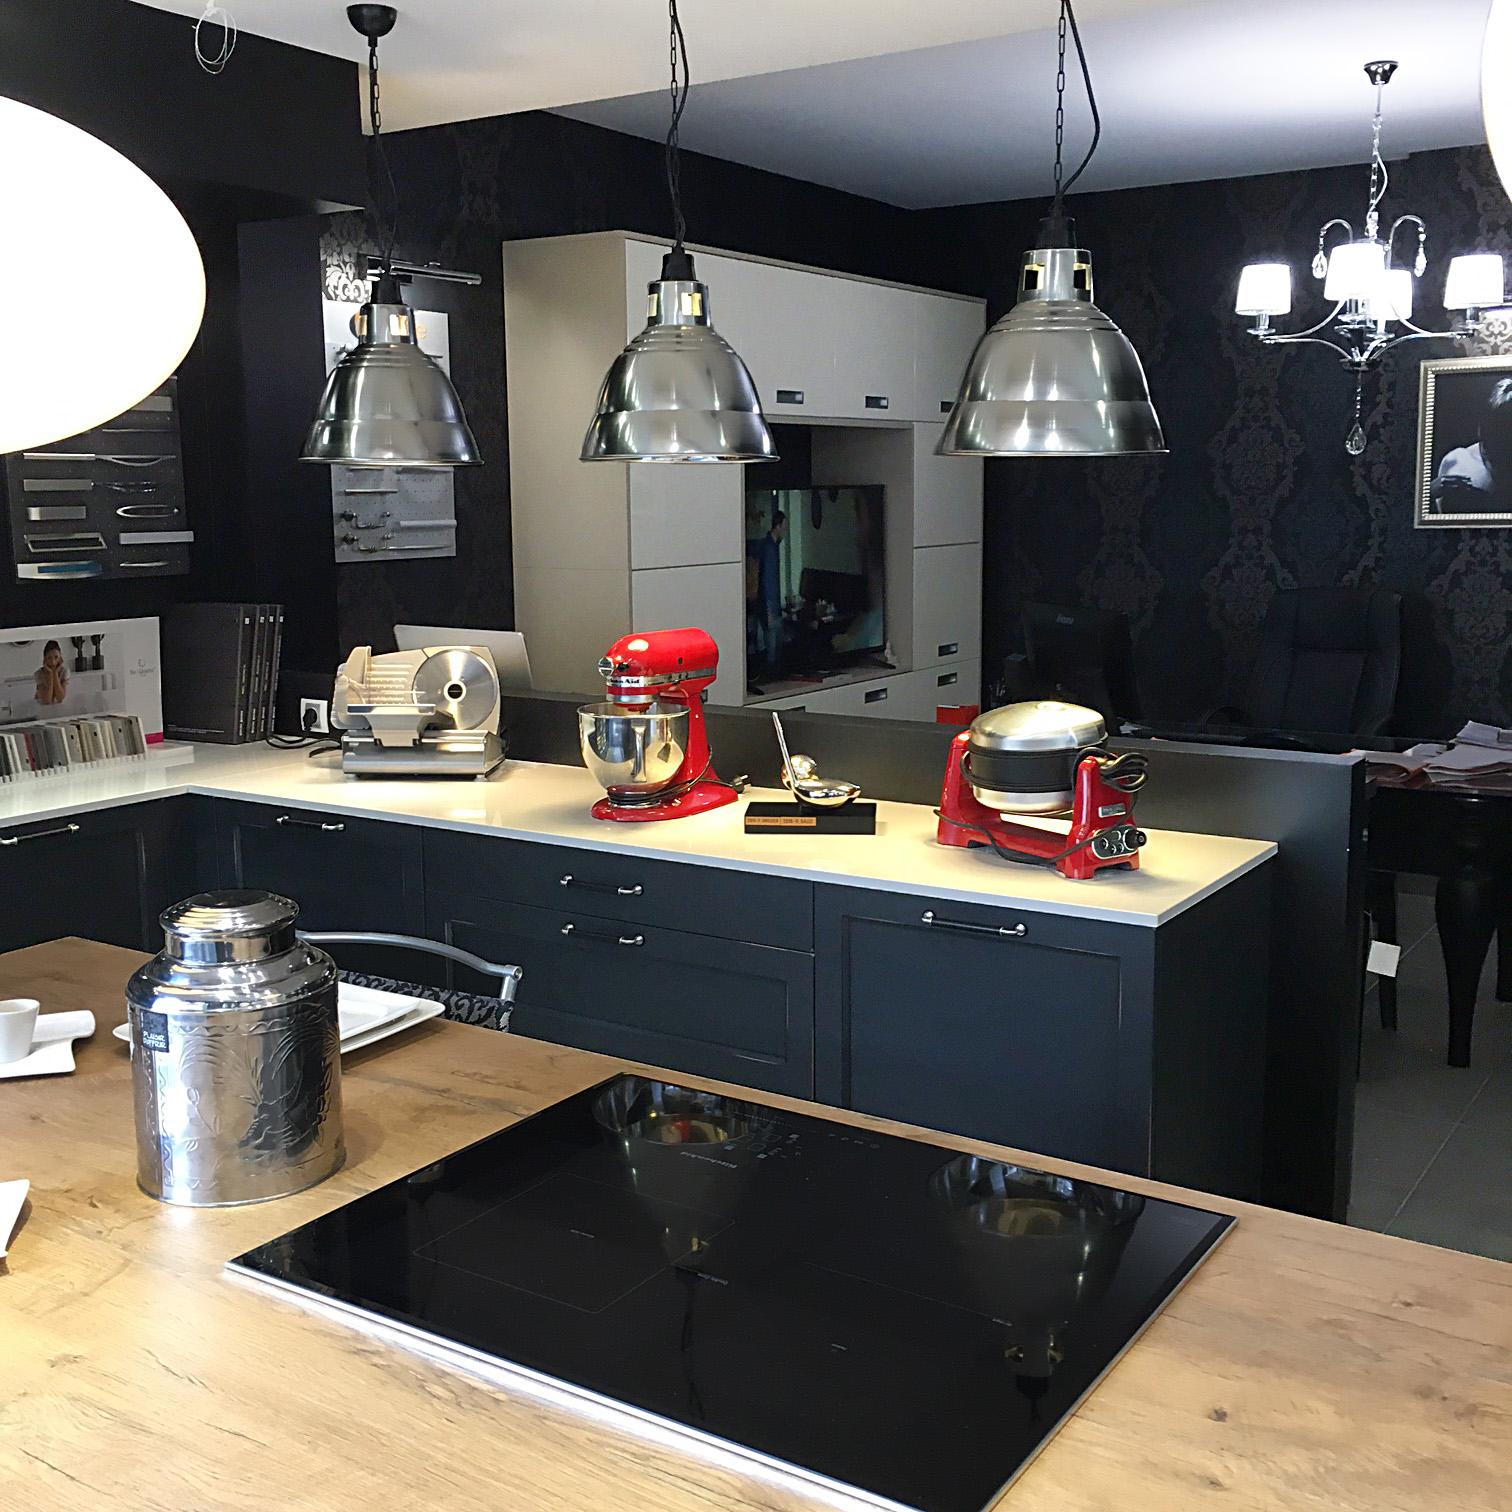 Les Ateliers Stéphane Lamour showroom-cuisine-stephane-lamour.jpg